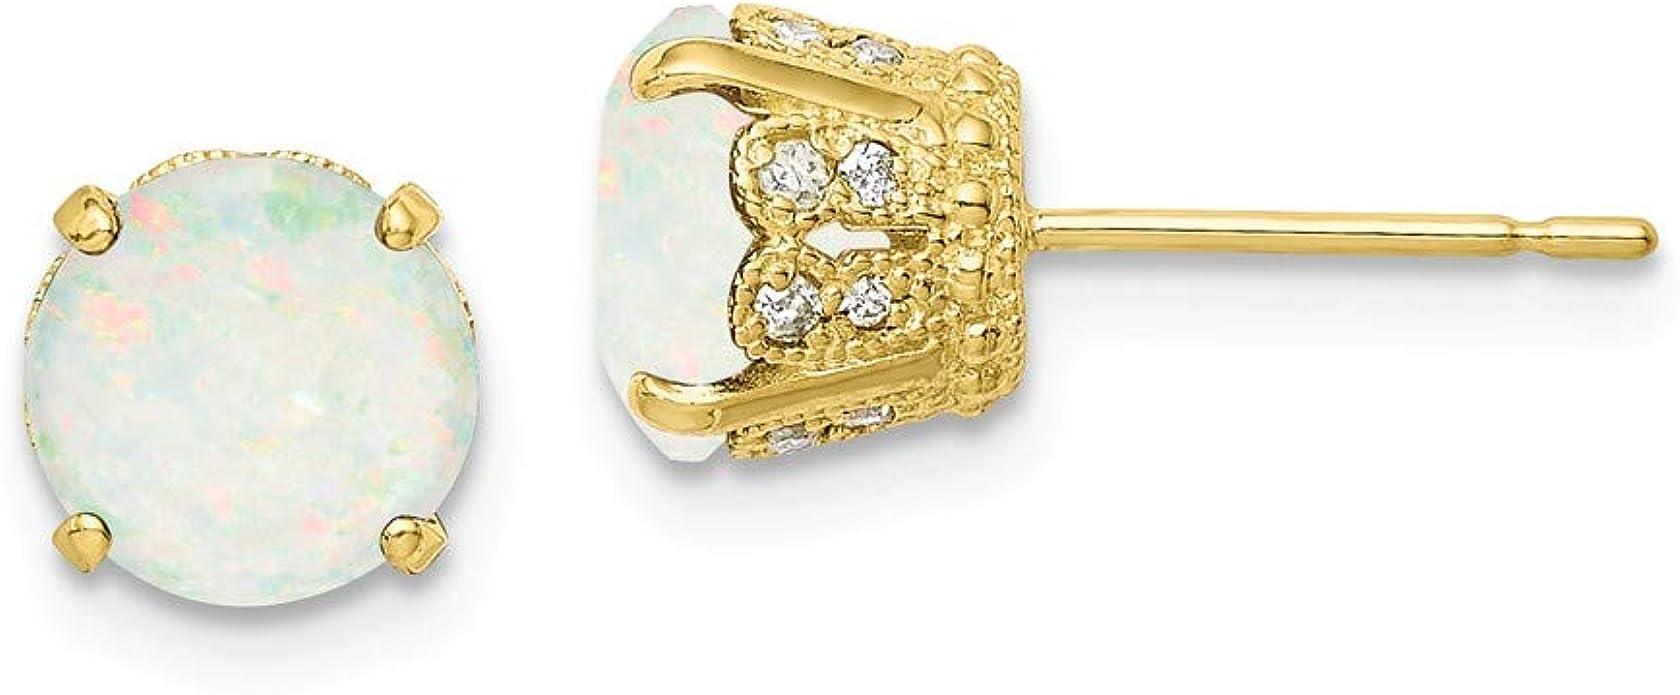 Mia Diamonds 10k Rose GoldRose Gold Textured Polished Hoop Earrings